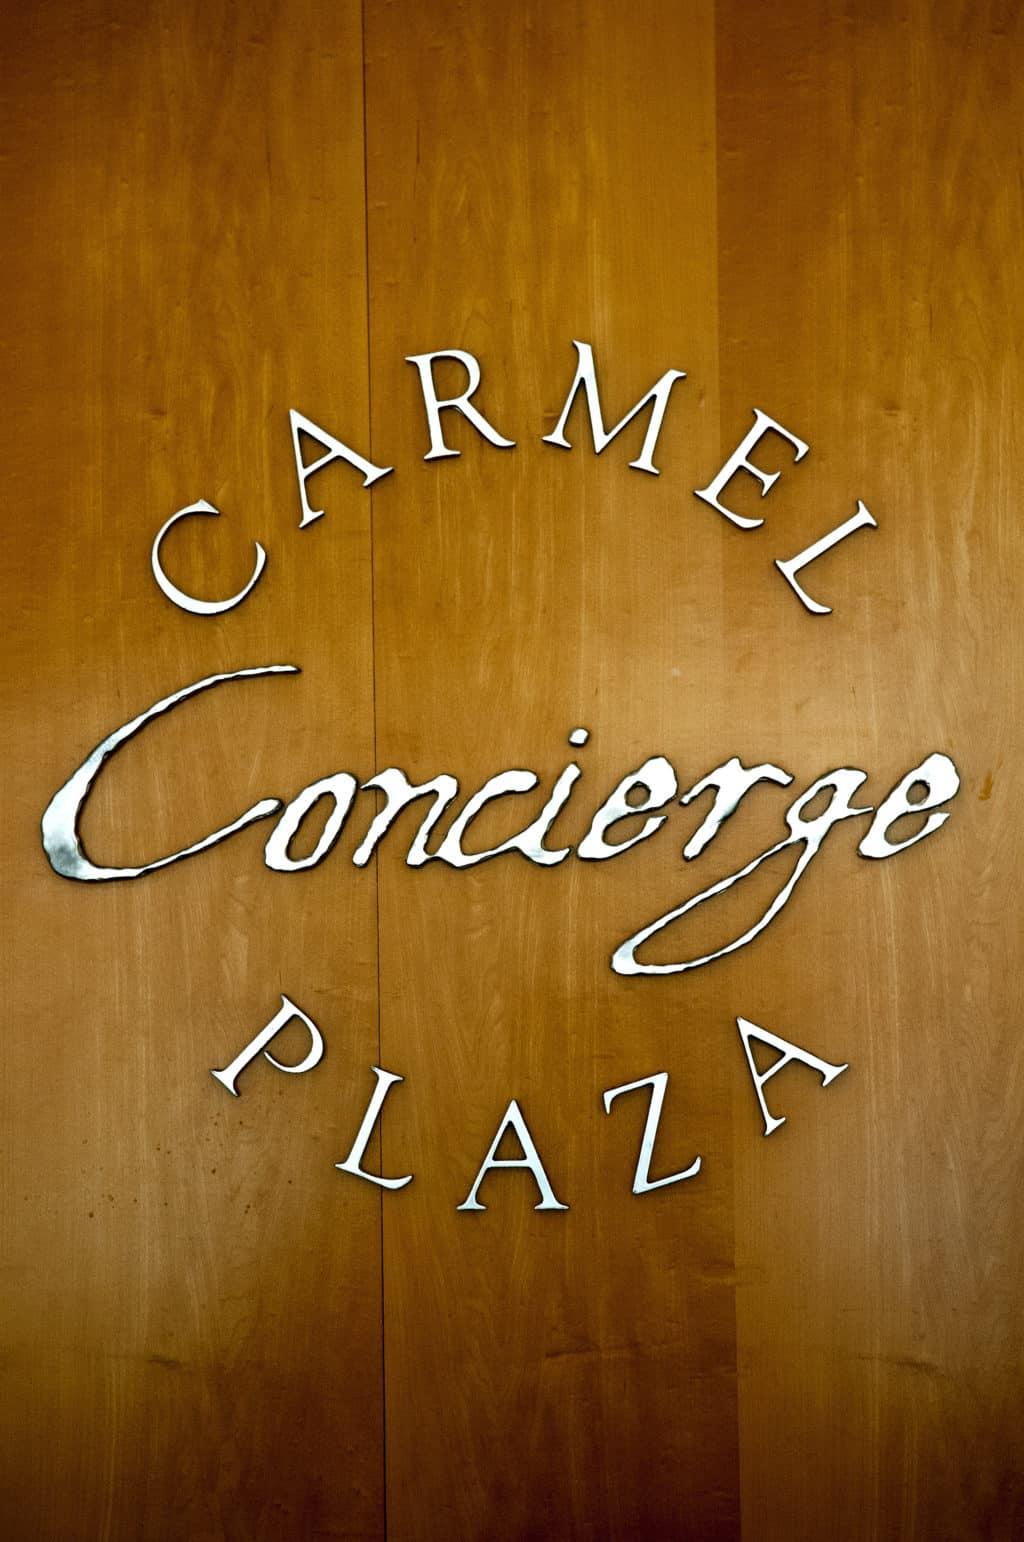 Carmel Plaza=08